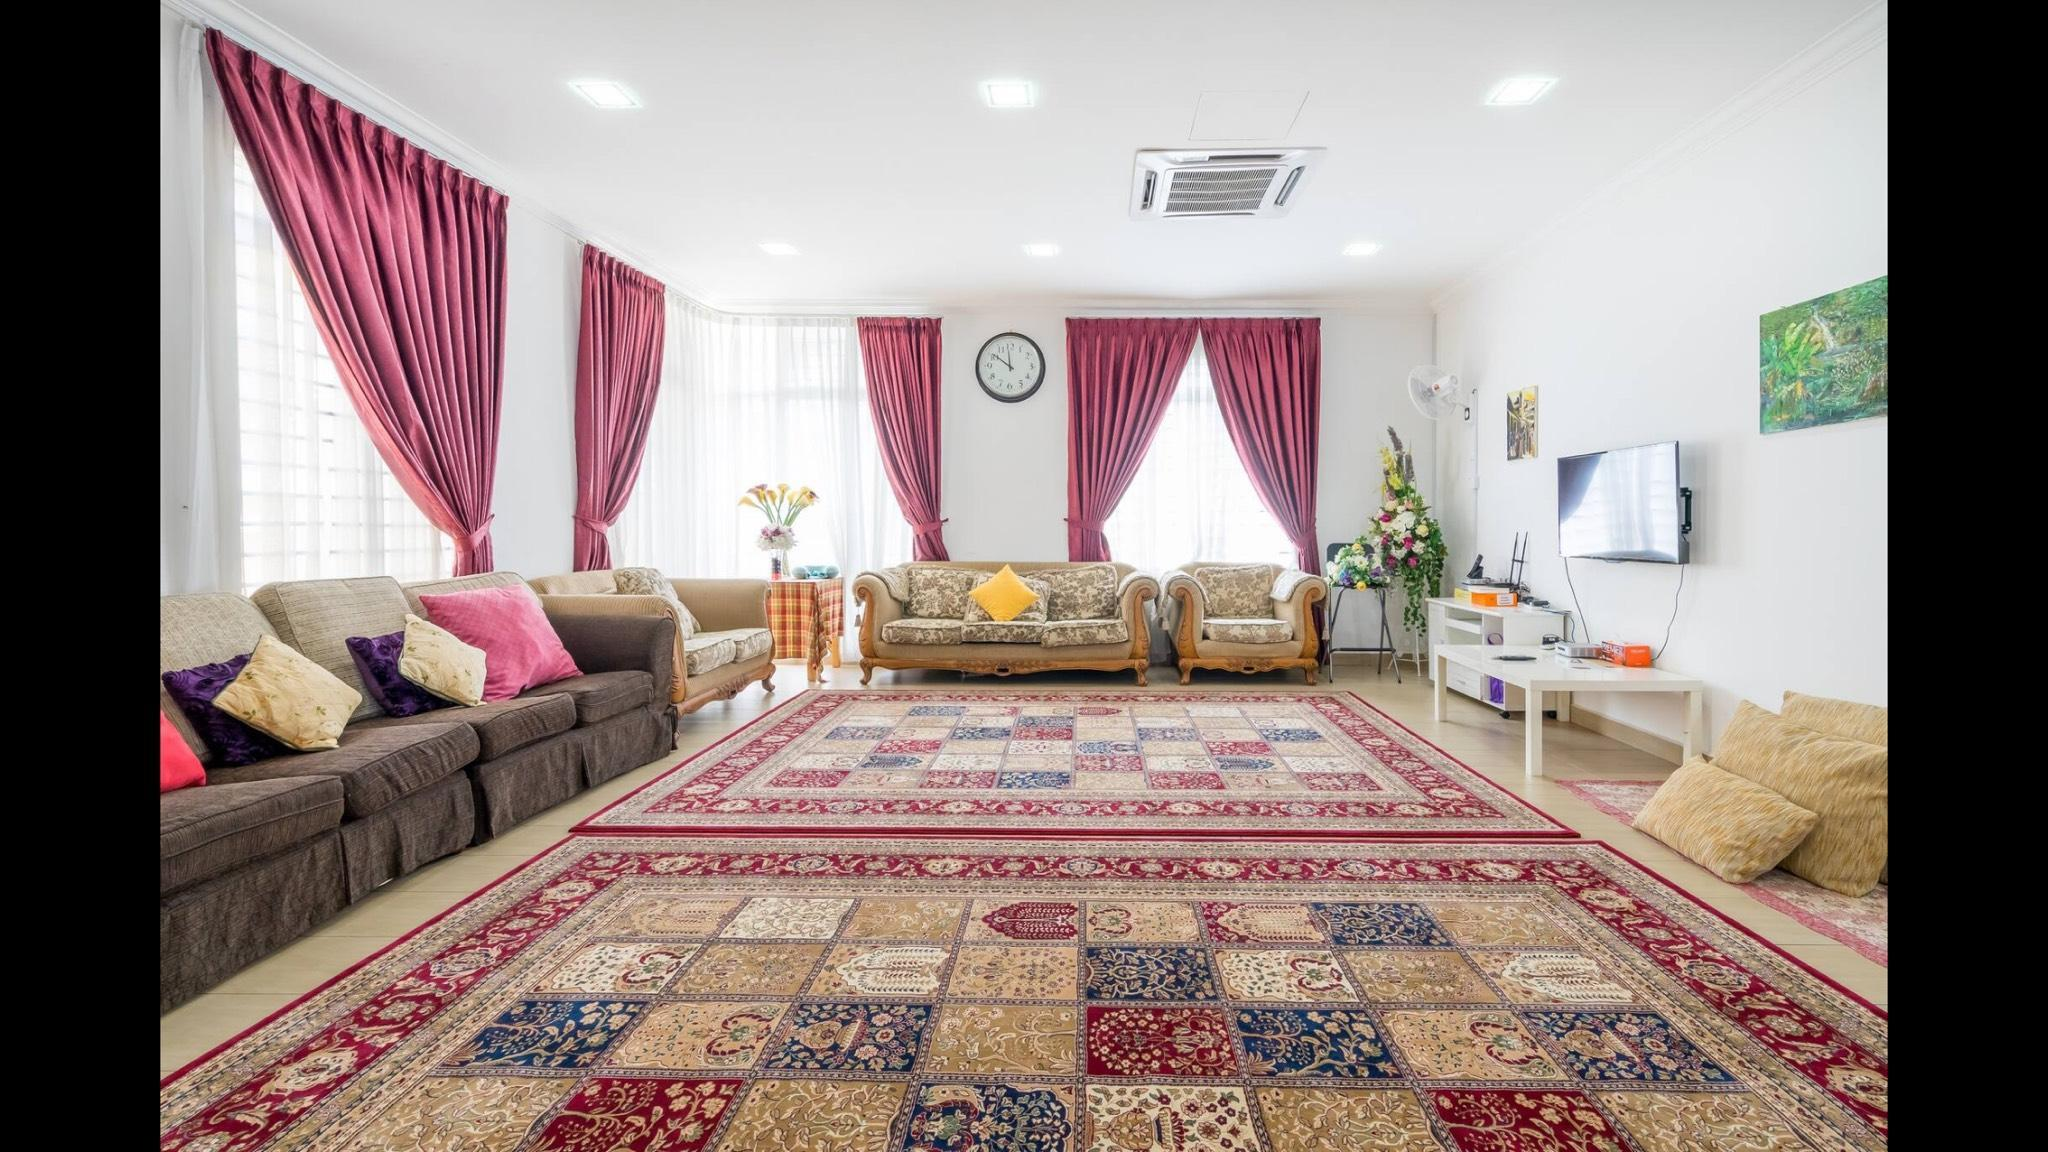 4B4R Spacious Semi D House For Family